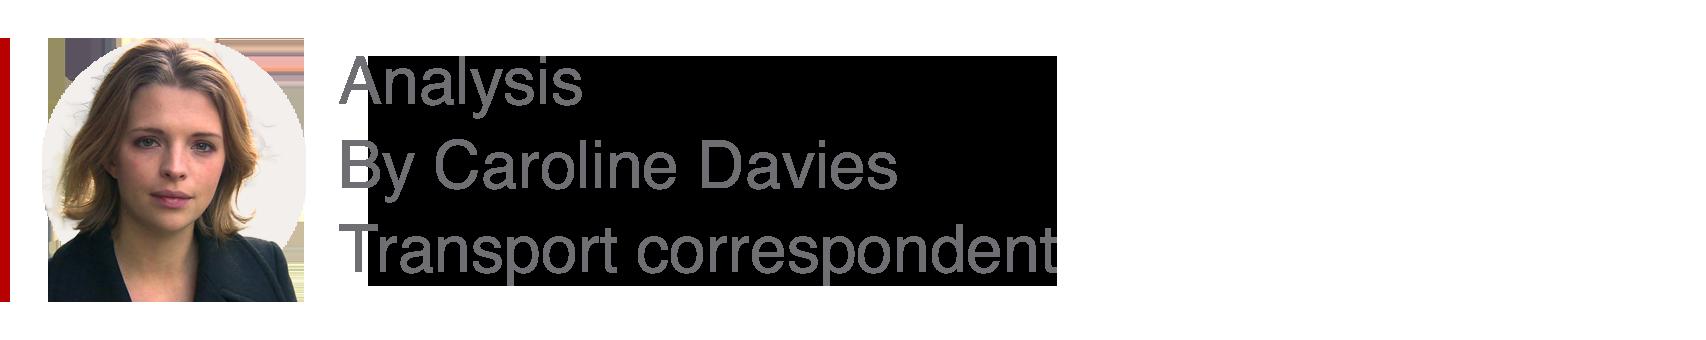 Analysis box by Caroline Davies, transport correspondent